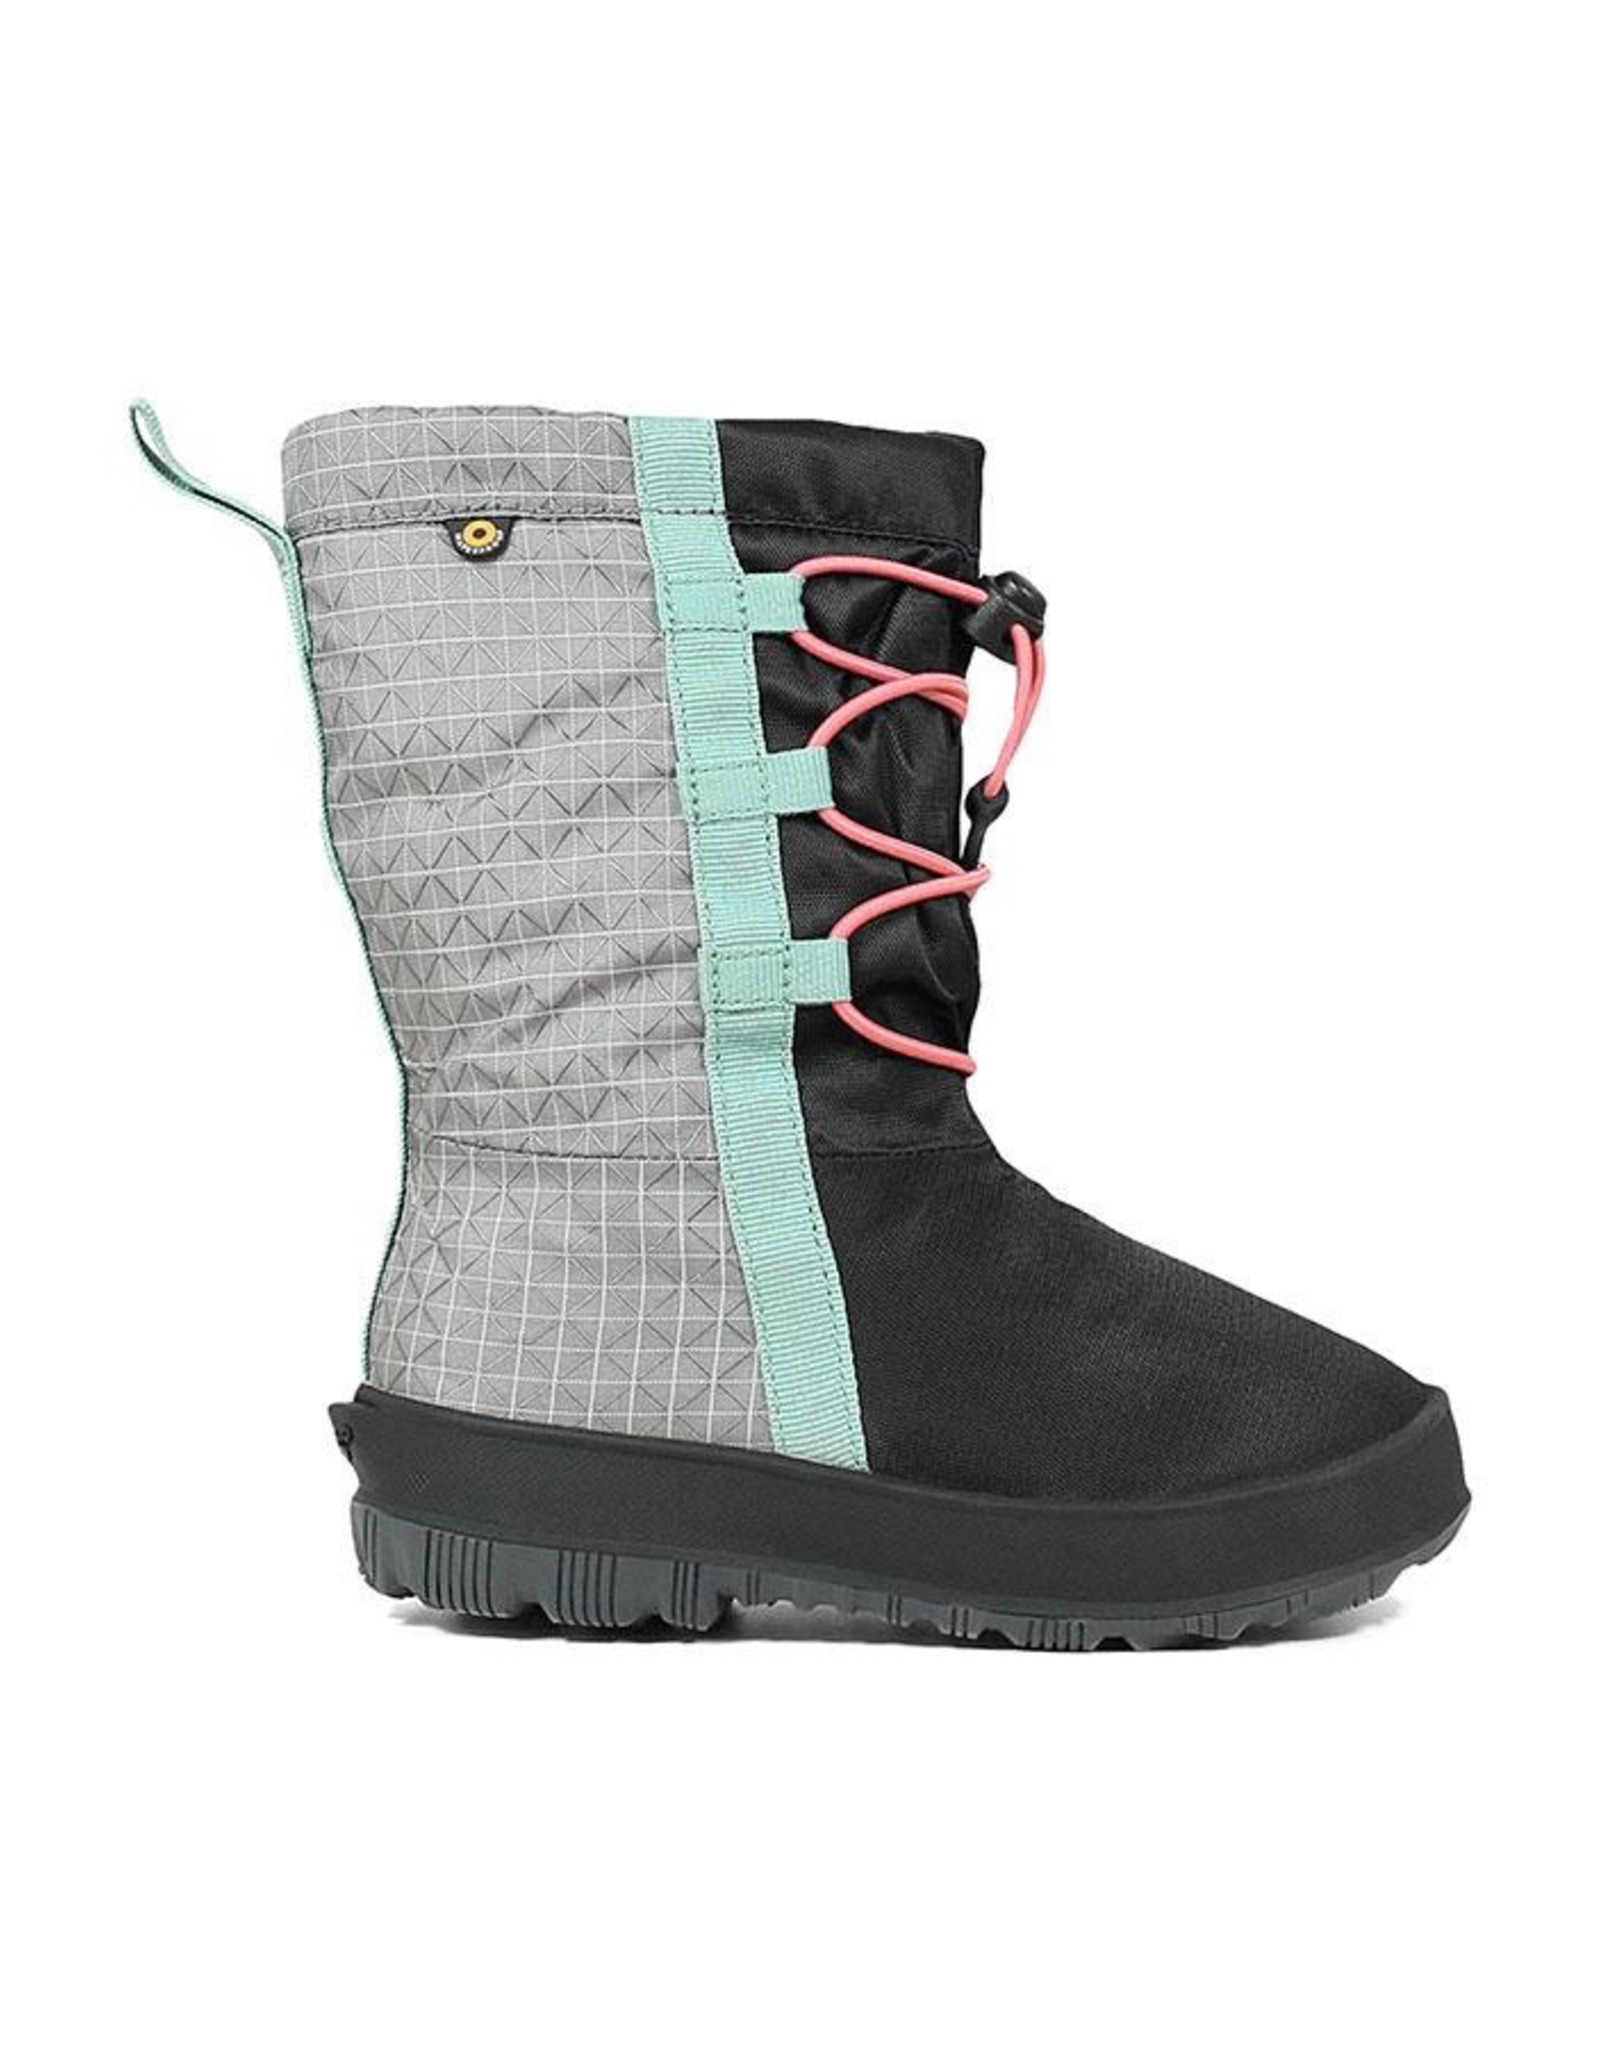 Bogs Kids Snownights Lightweight Waterproof Boots